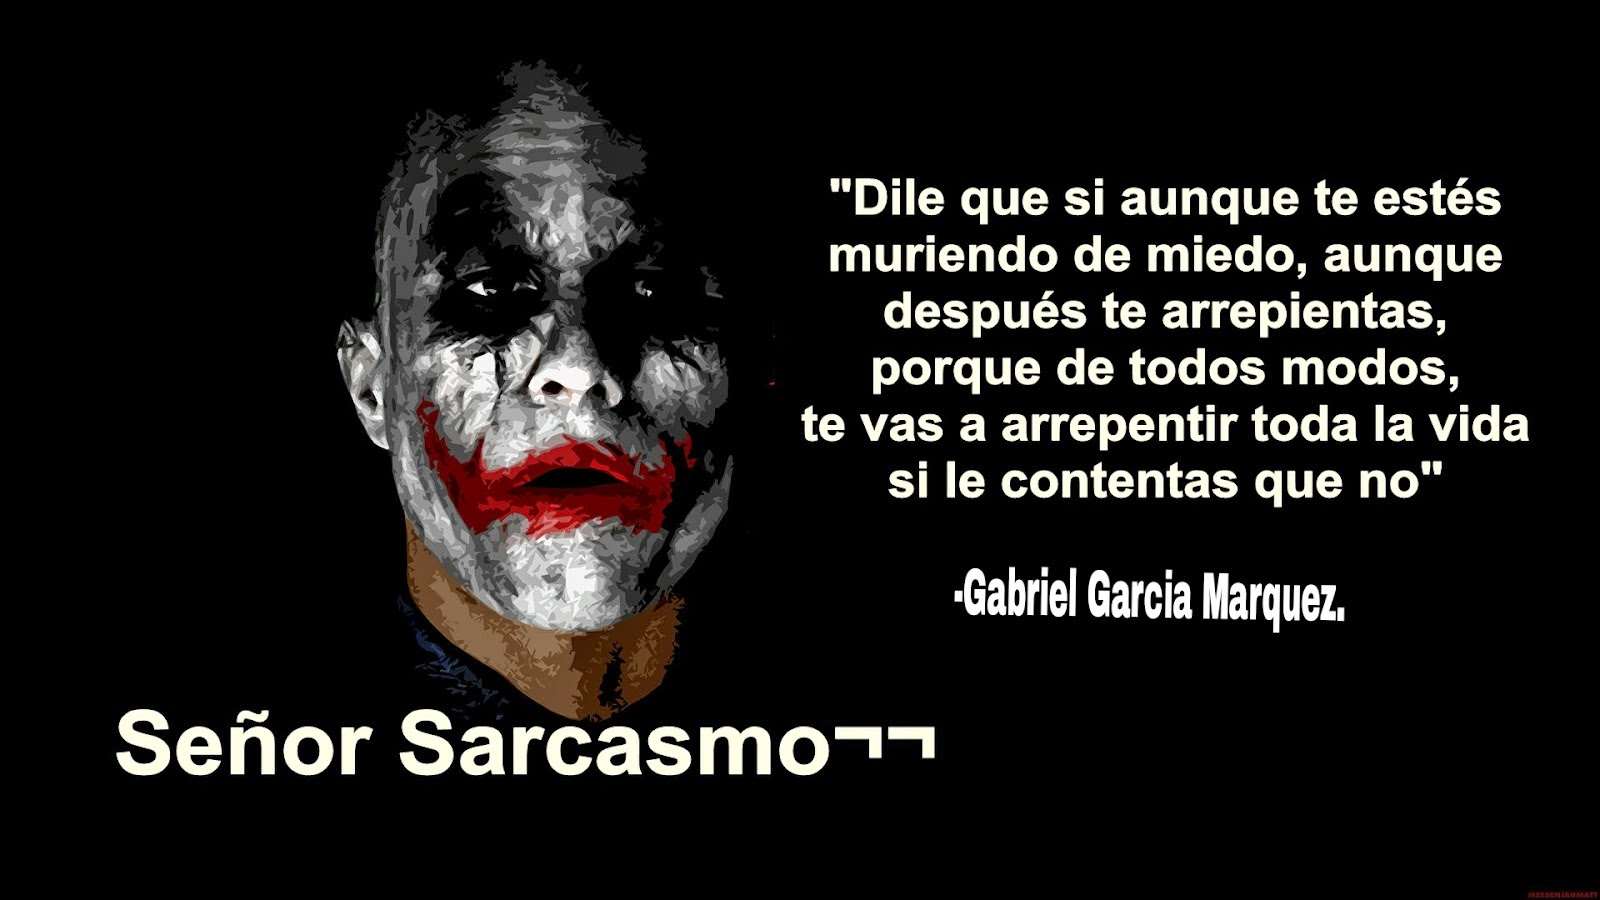 and harmful content gt Frases De Sarcasmo Imagenes Frases De Sarcasmo